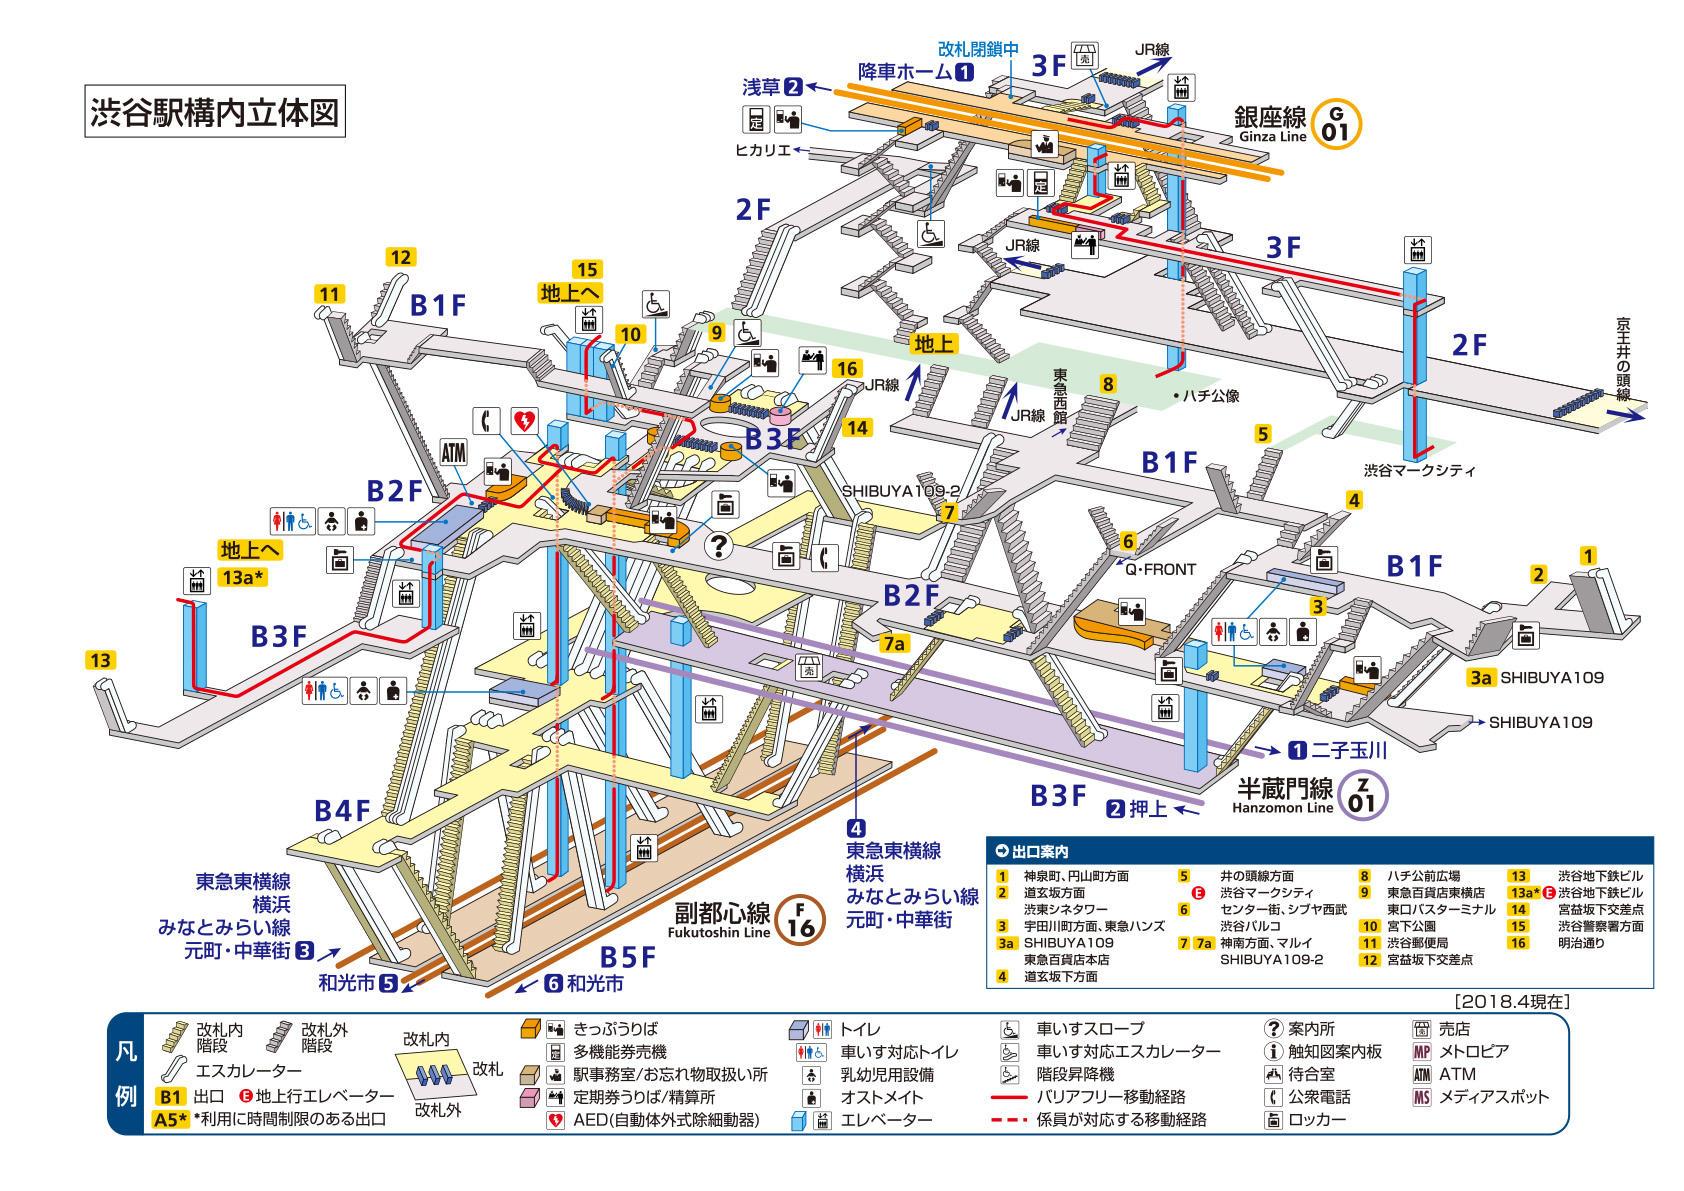 新宿駅のご案内|小田急電鉄 - odakyu.jp